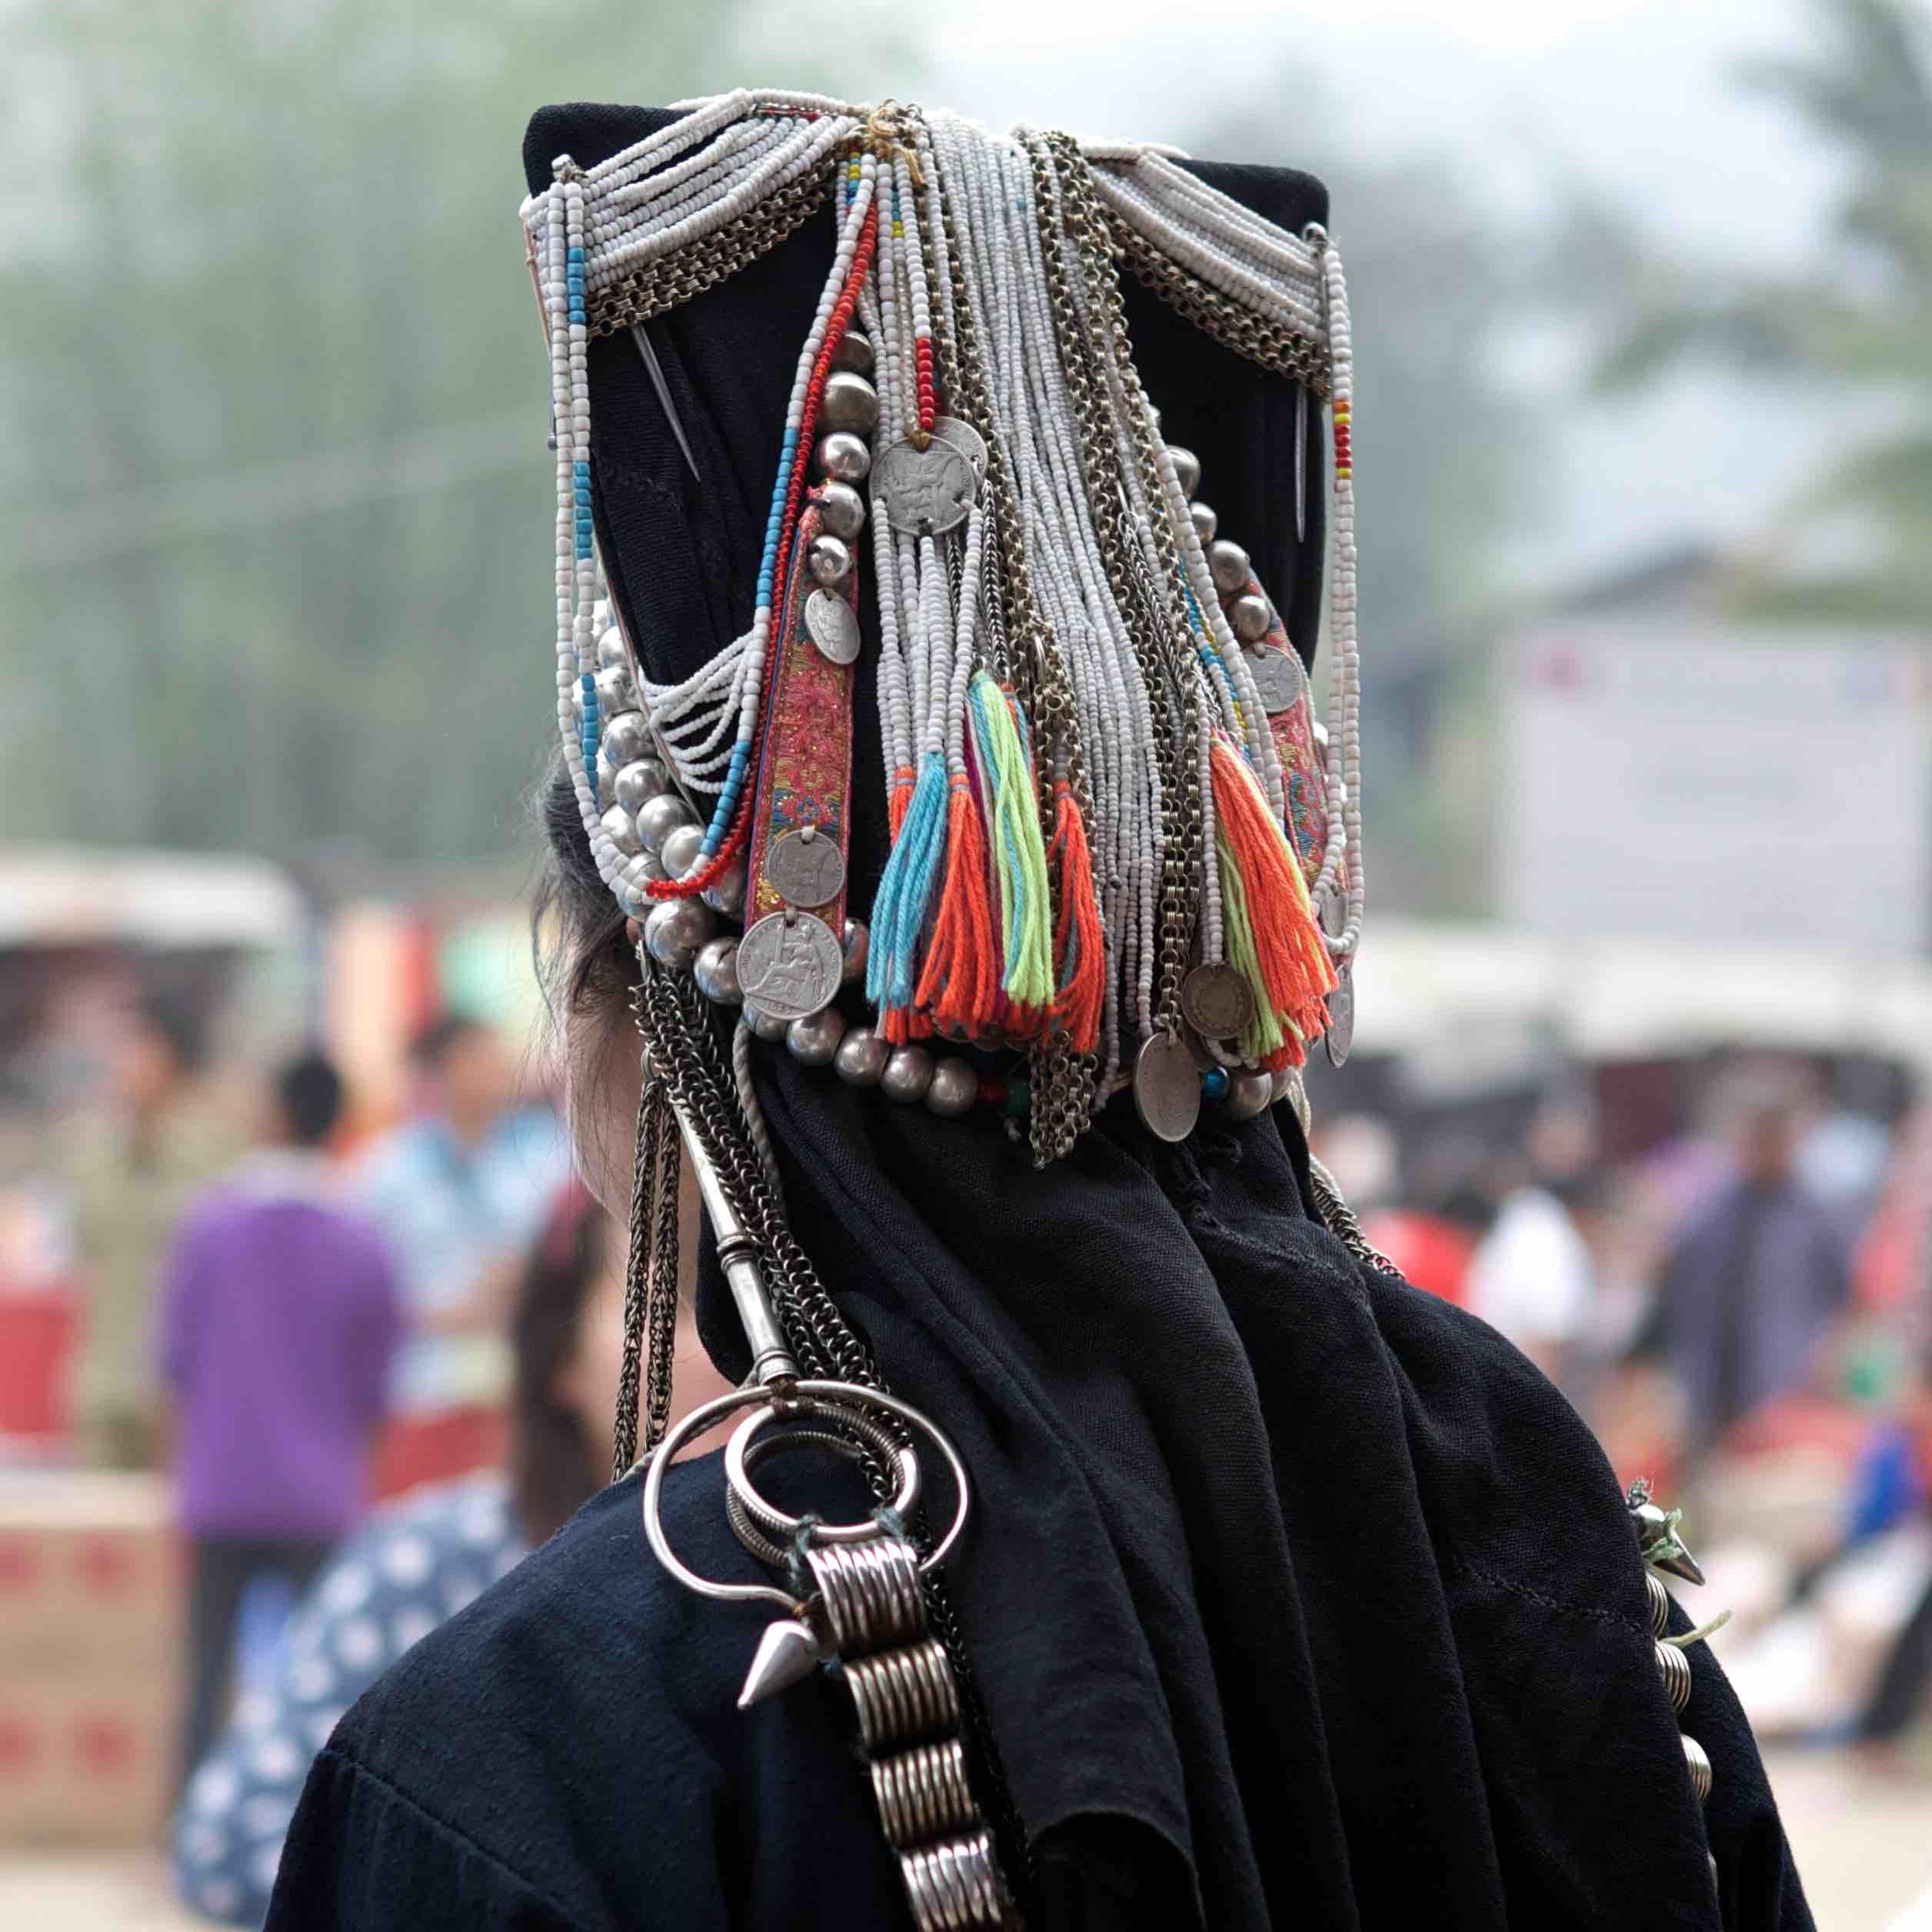 northern-laos-phongsali-hatsa-people-decorated-hat-tiger-trail-photo-by-cyril-eberle-CEB-8266